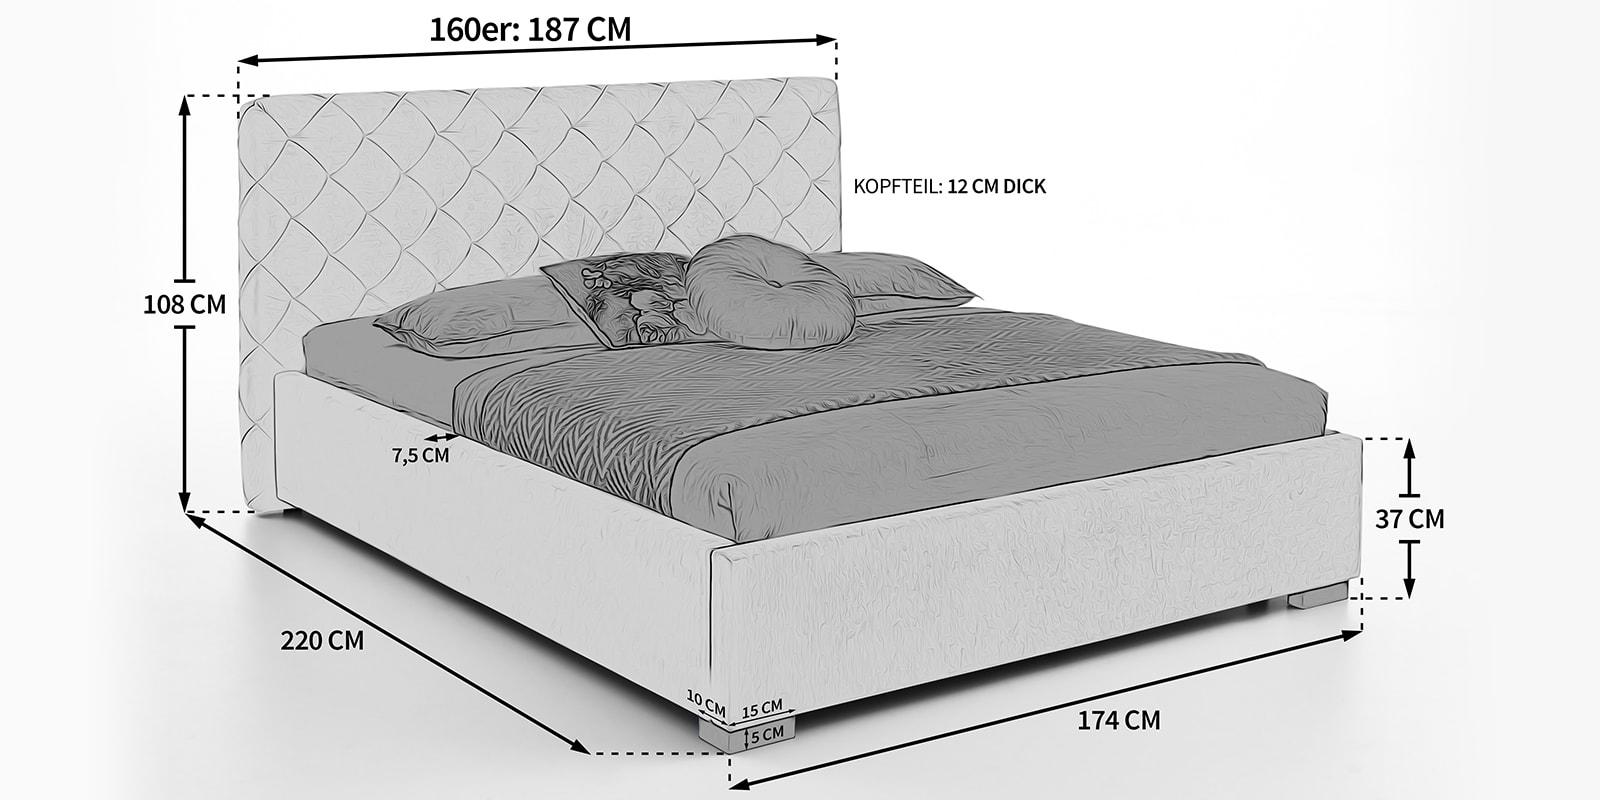 Moebella24 - Bet - mit - Bettkasten - Elsa - Skizze - Maße - 160x200cm -Samt - Polsterbett -